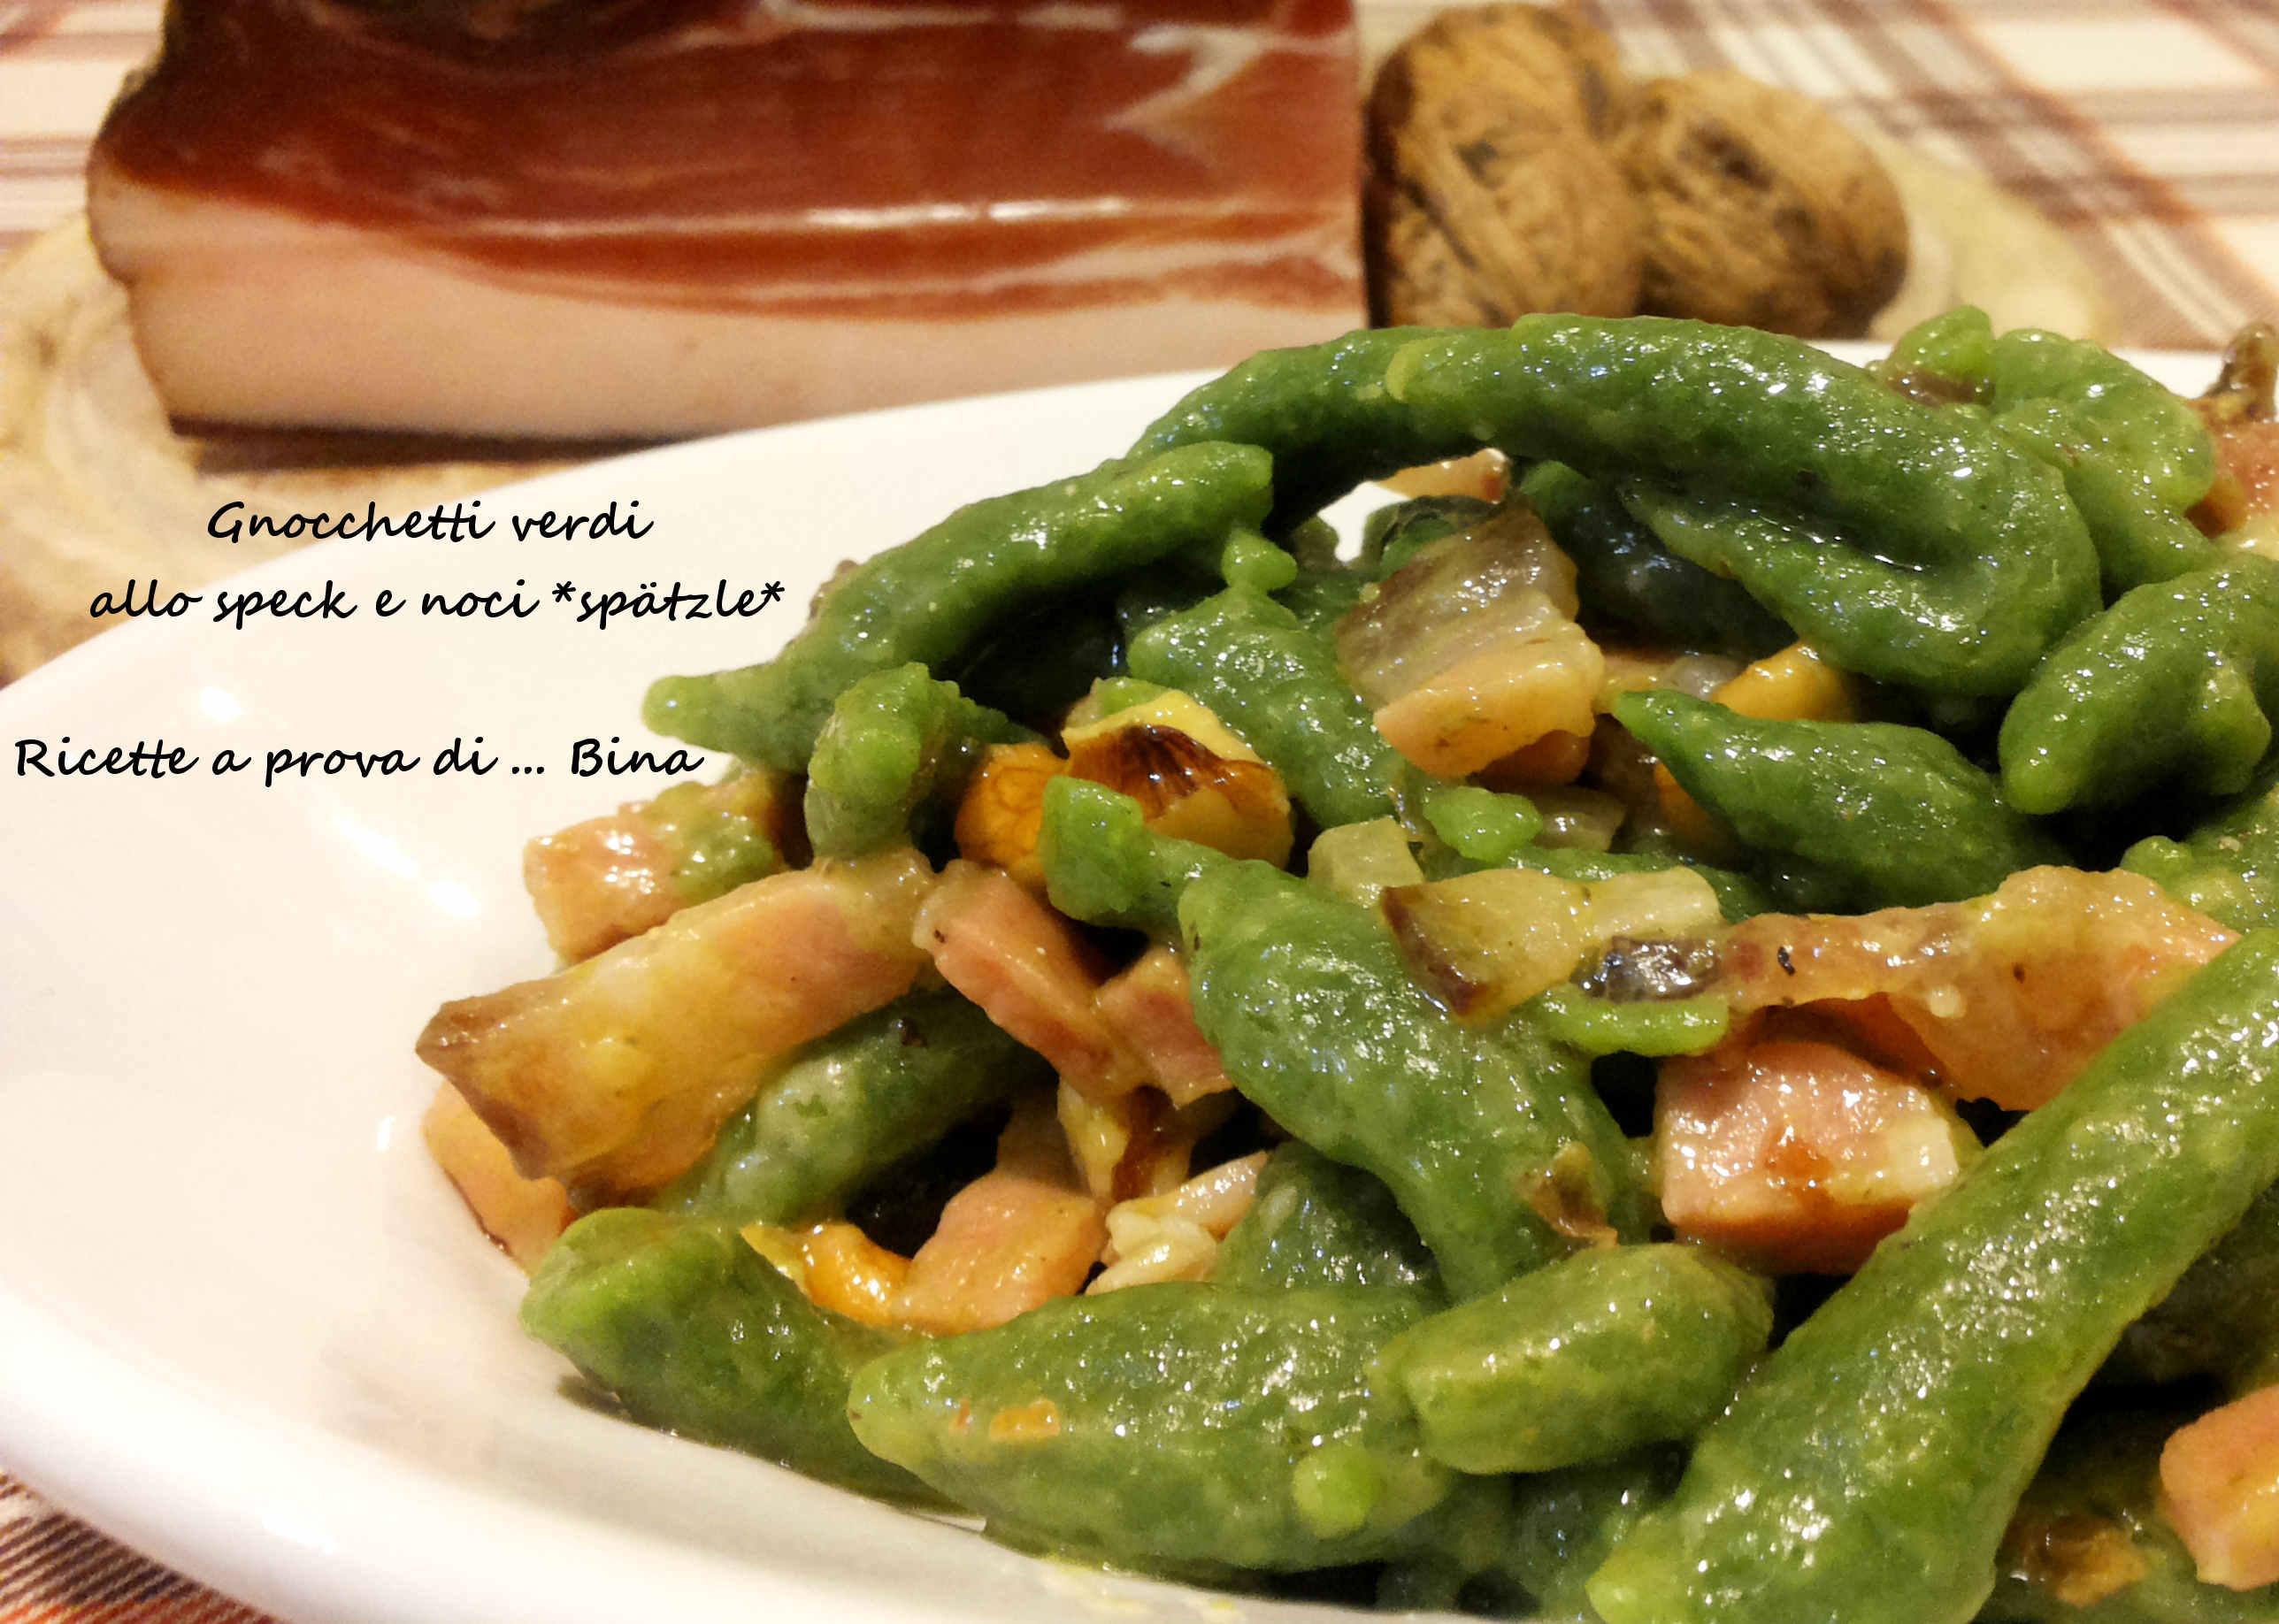 Ricette Gnocchetti Verdi Tirolesi.Gnocchetti Verdi Allo Speck E Noci Spatzle Ricette A Prova Di Bina